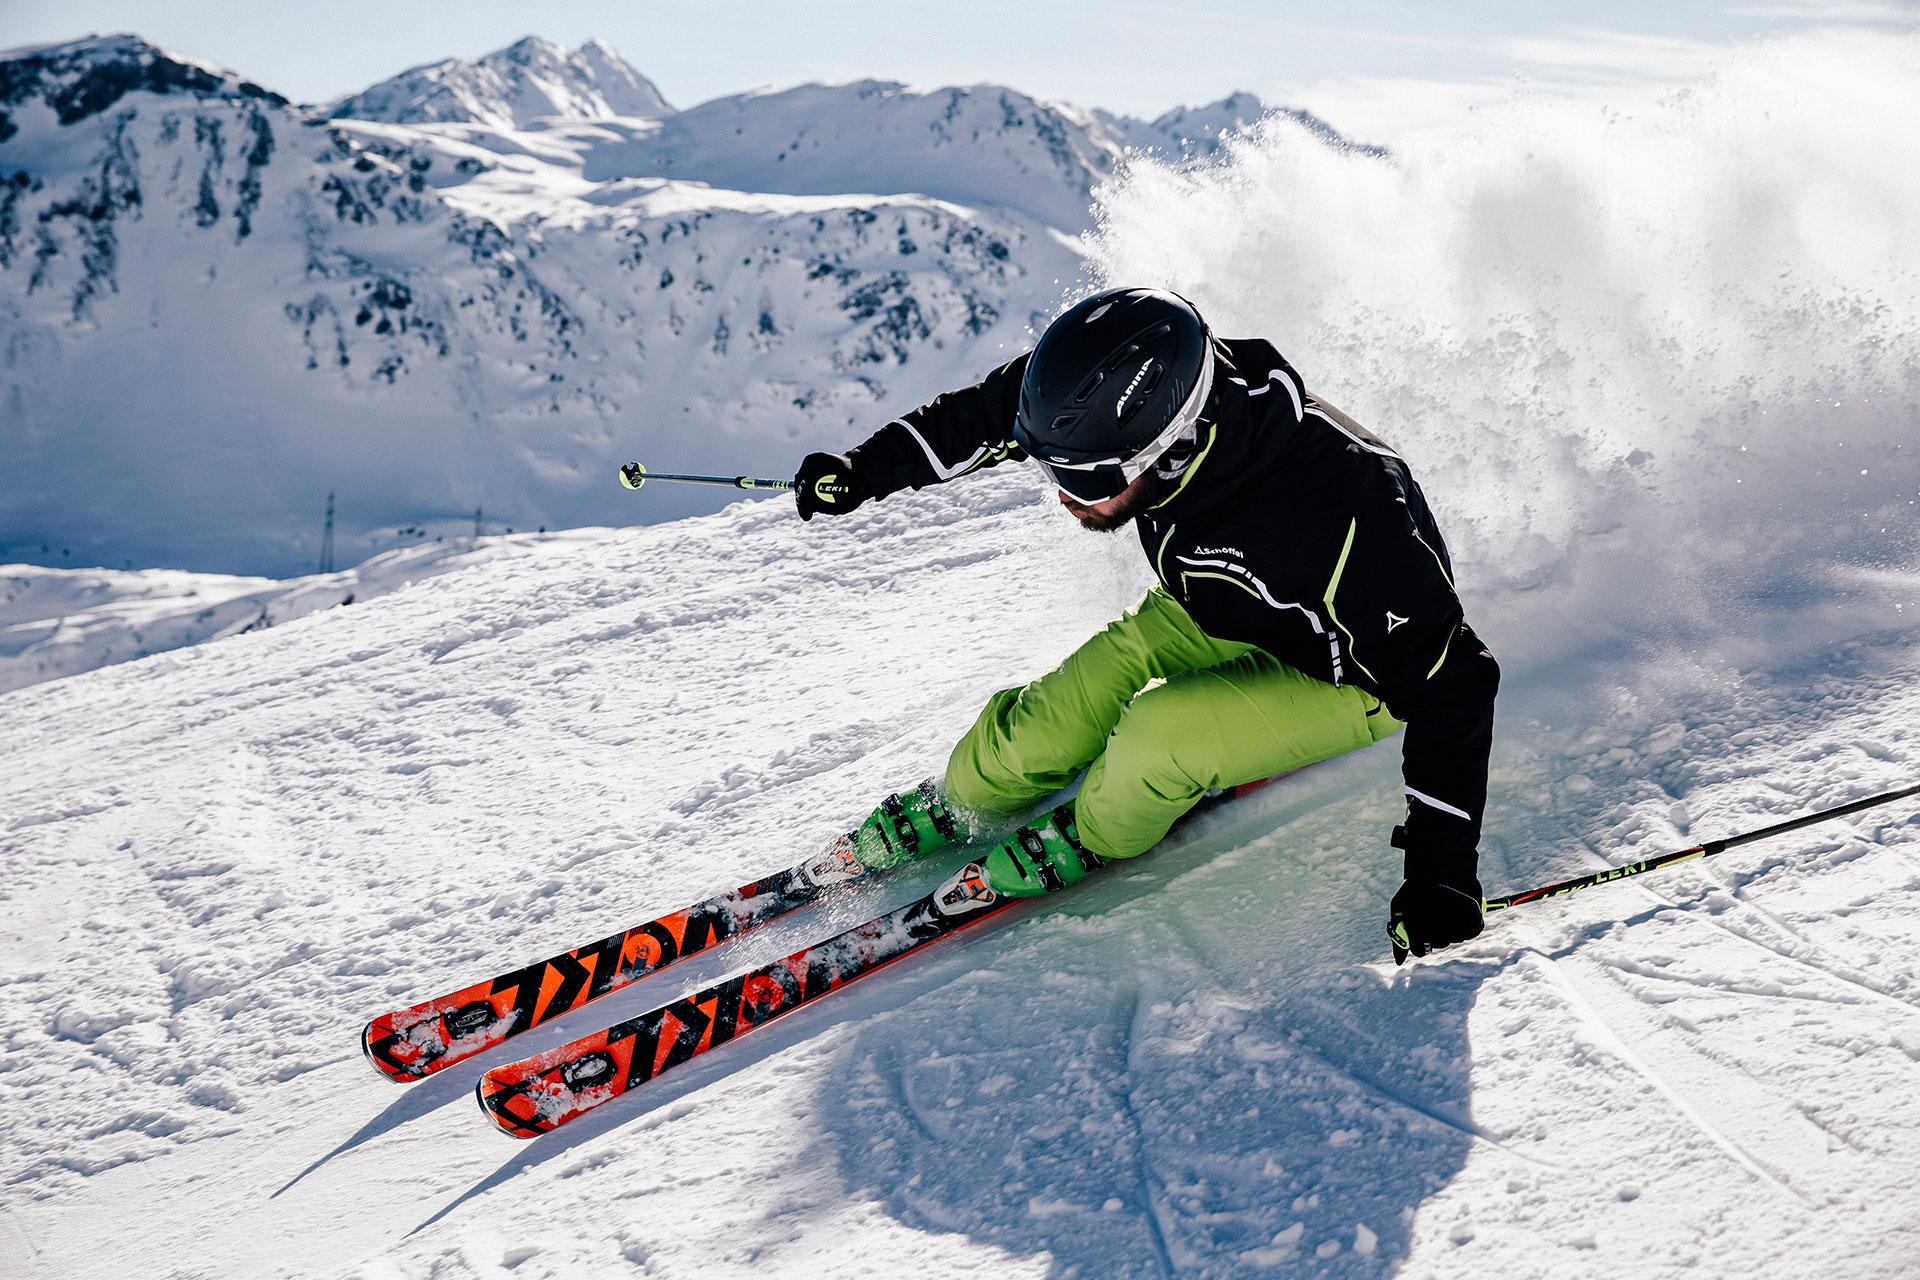 Fotograf Bekleidung winter Ski Alpin Katalog Fotoproduktion London United Kingdom